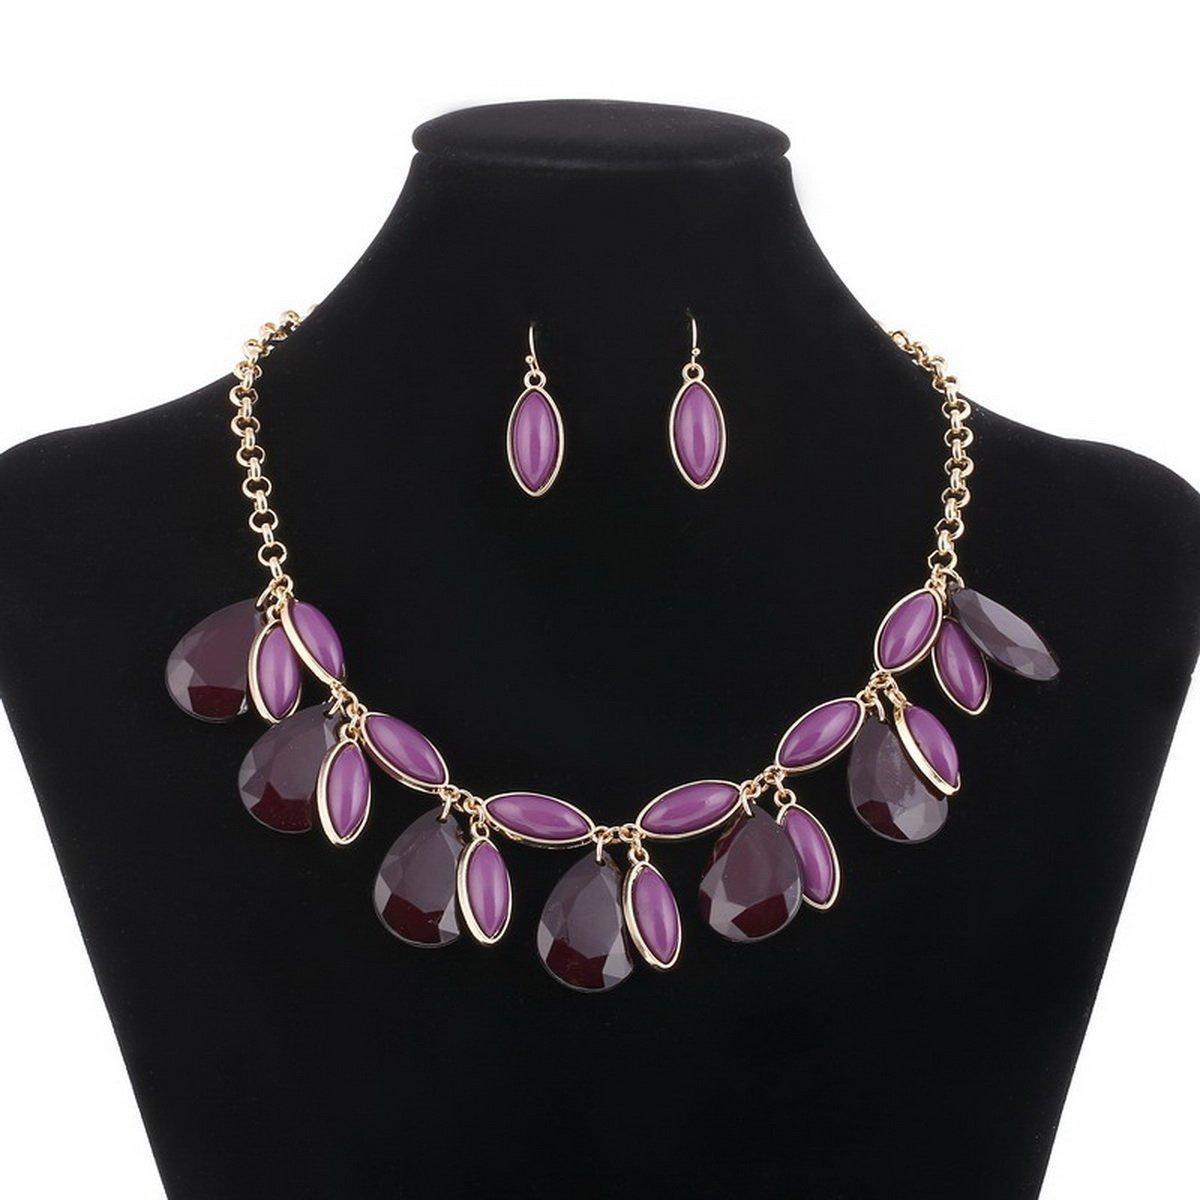 ARICO Multi Layer Jewelry Sets Tessal Necklace Set Earrings Parure Bijoux Femme Jewellery Gold Plated Jewelry Set NE248